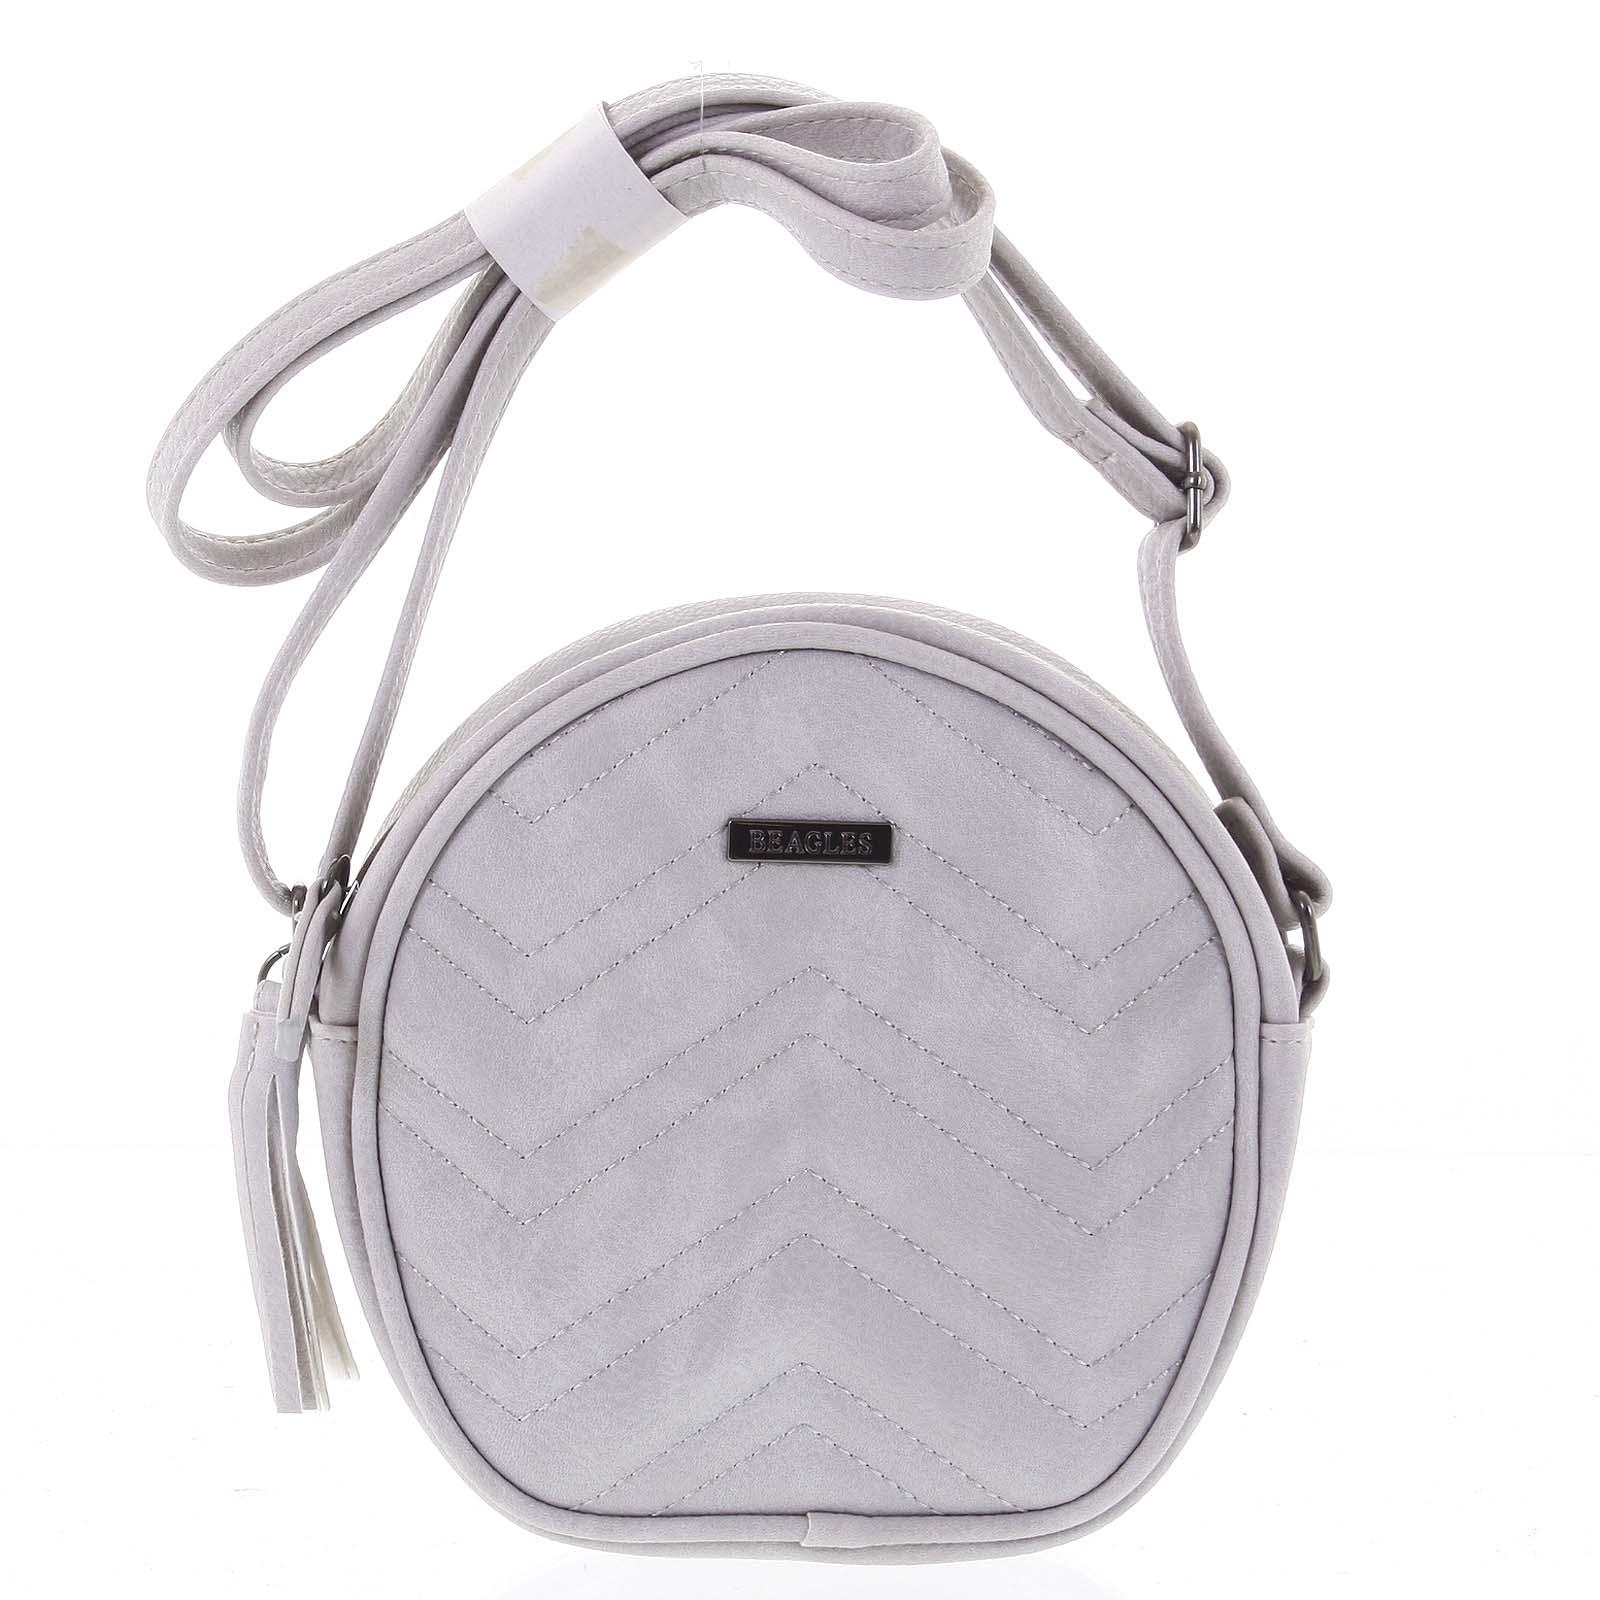 Malá trendy crossbody kabelka světle šedá  - Beagles Mana